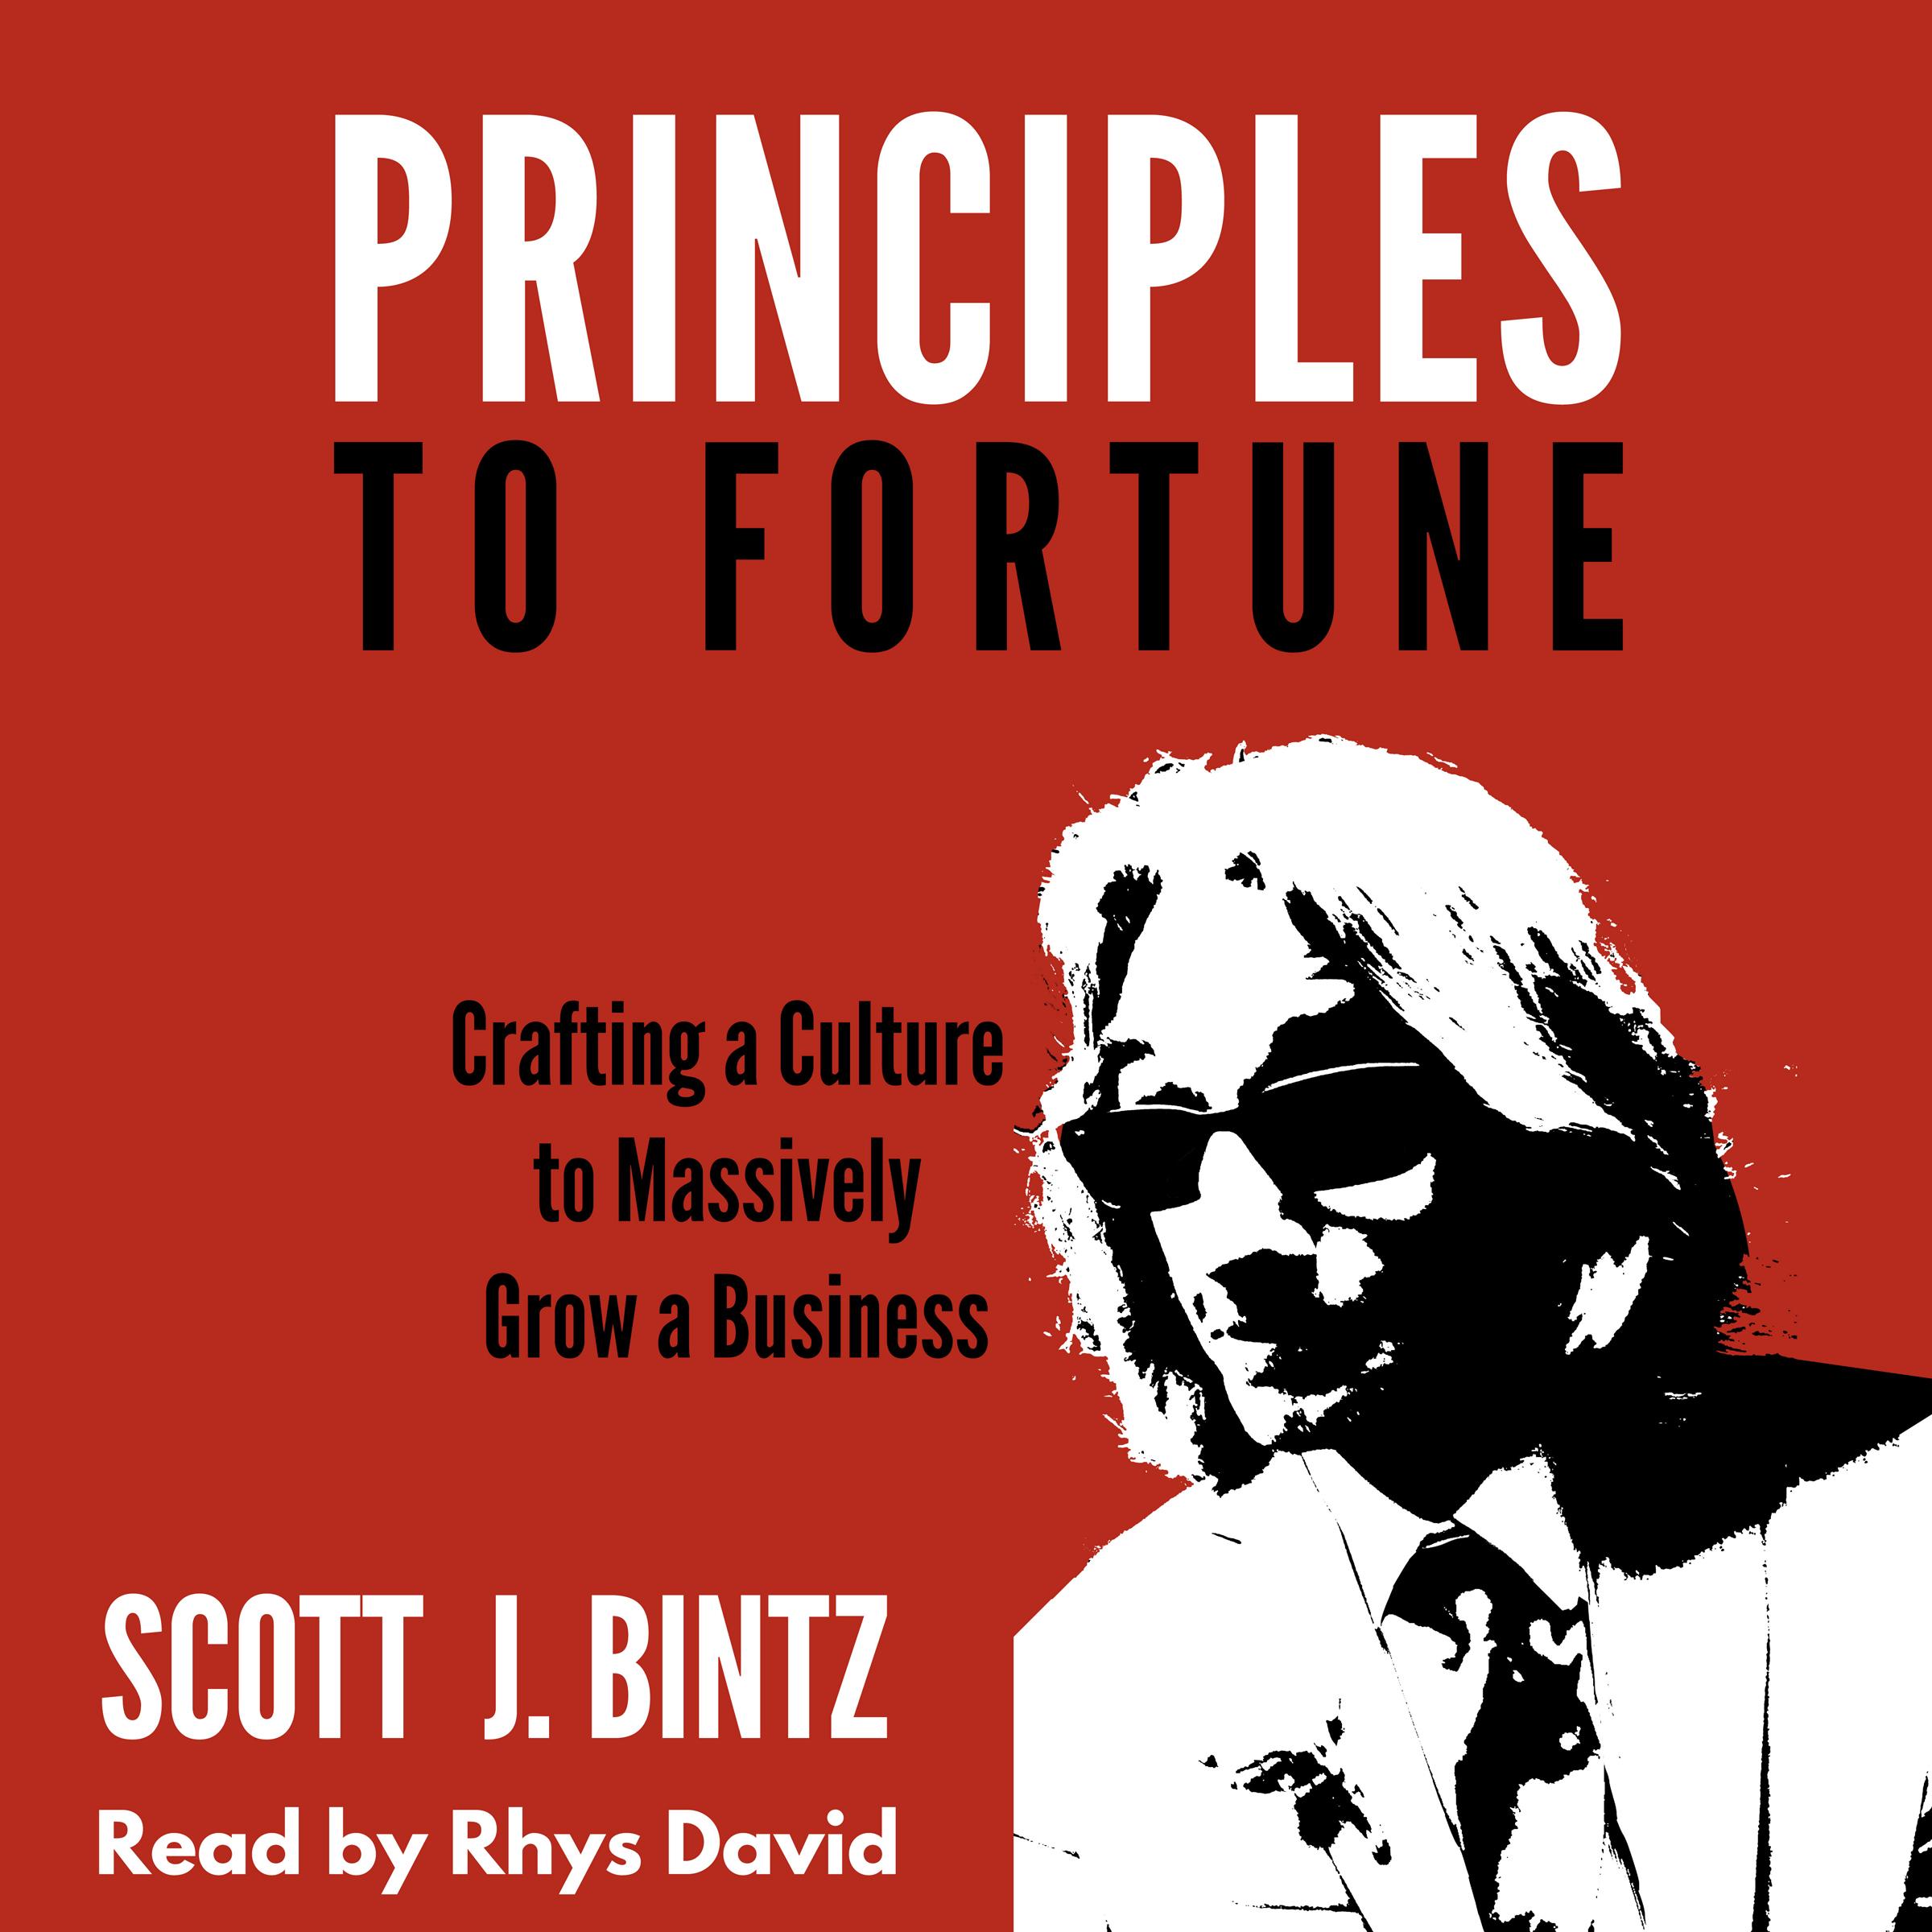 Principles To Fortune - Audio Book